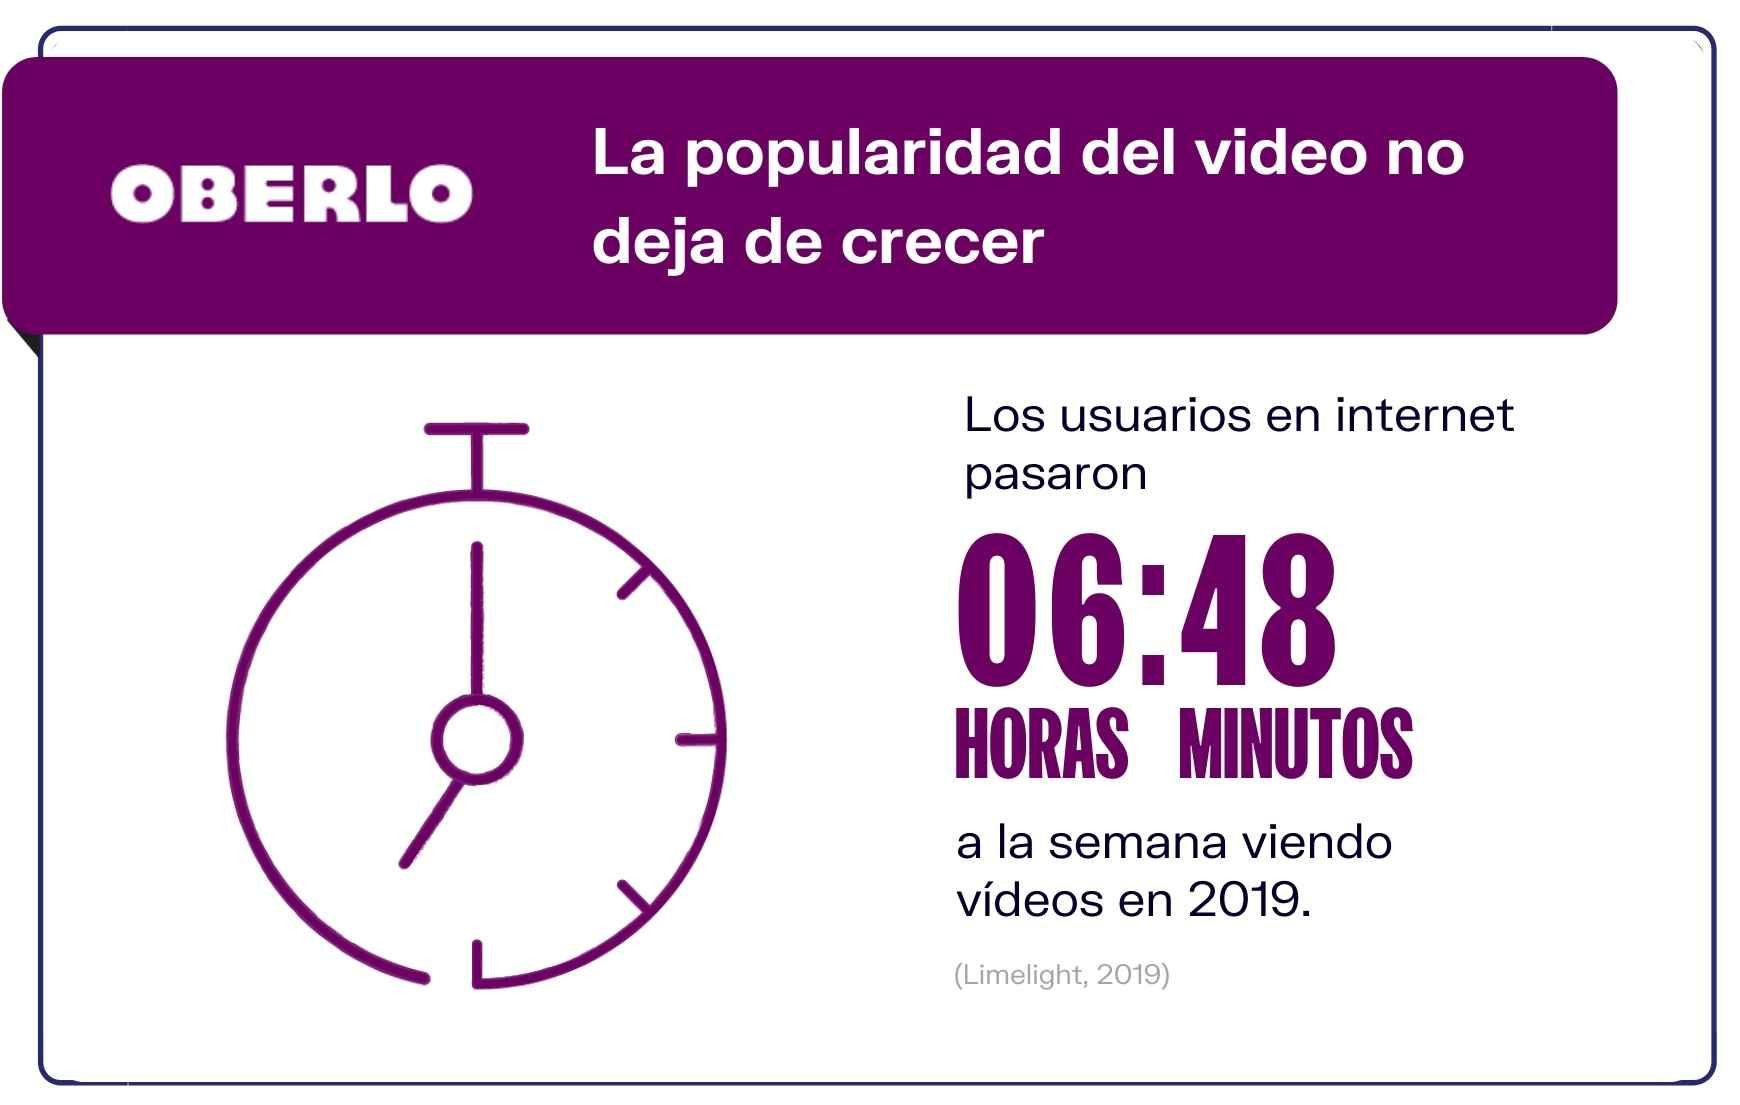 Datos marketing video